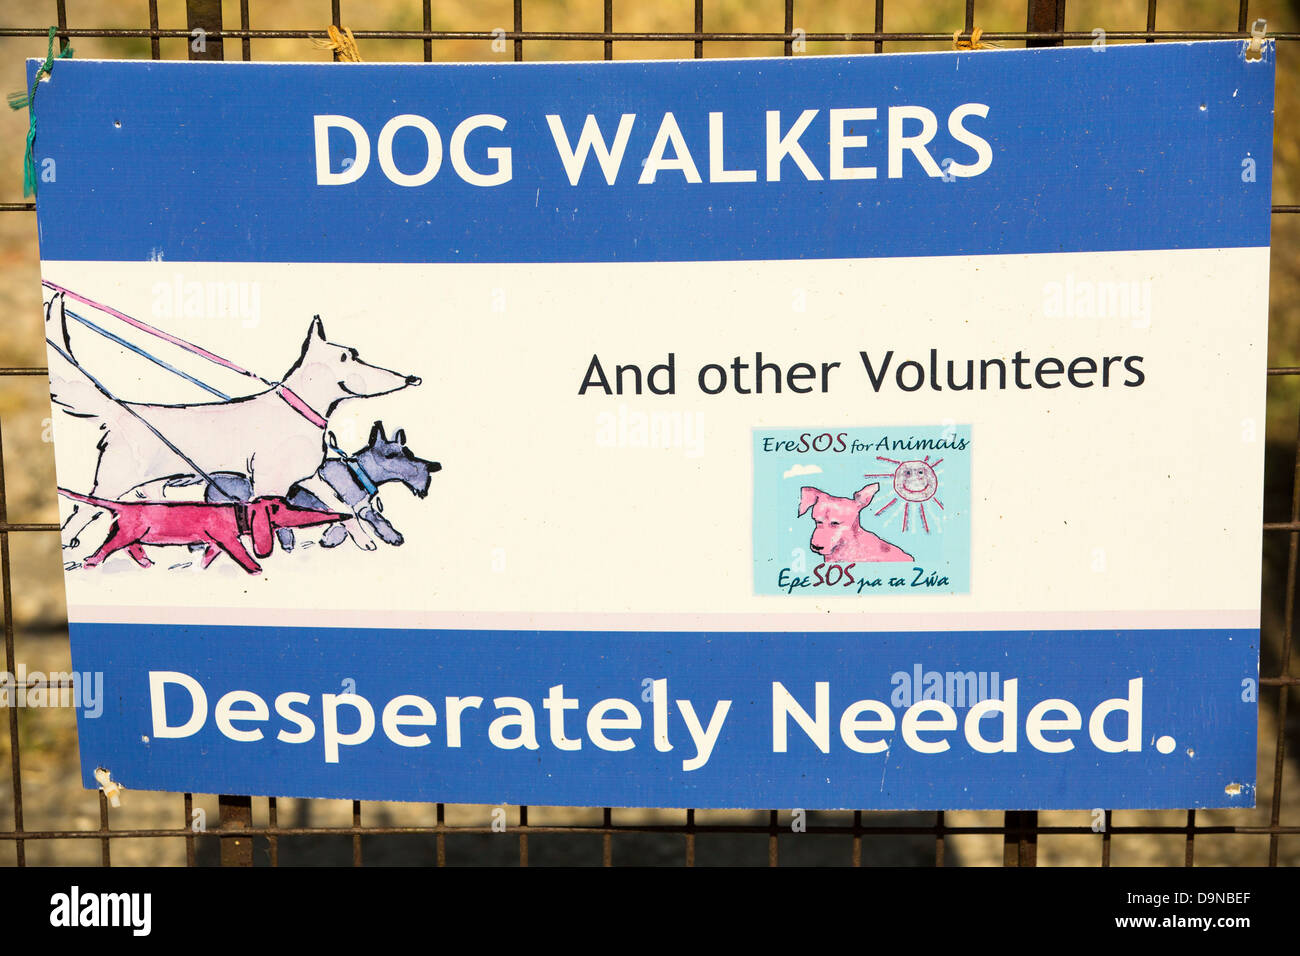 An animal welfare charity in Skala Eresou on Lesvos, Greece. - Stock Image